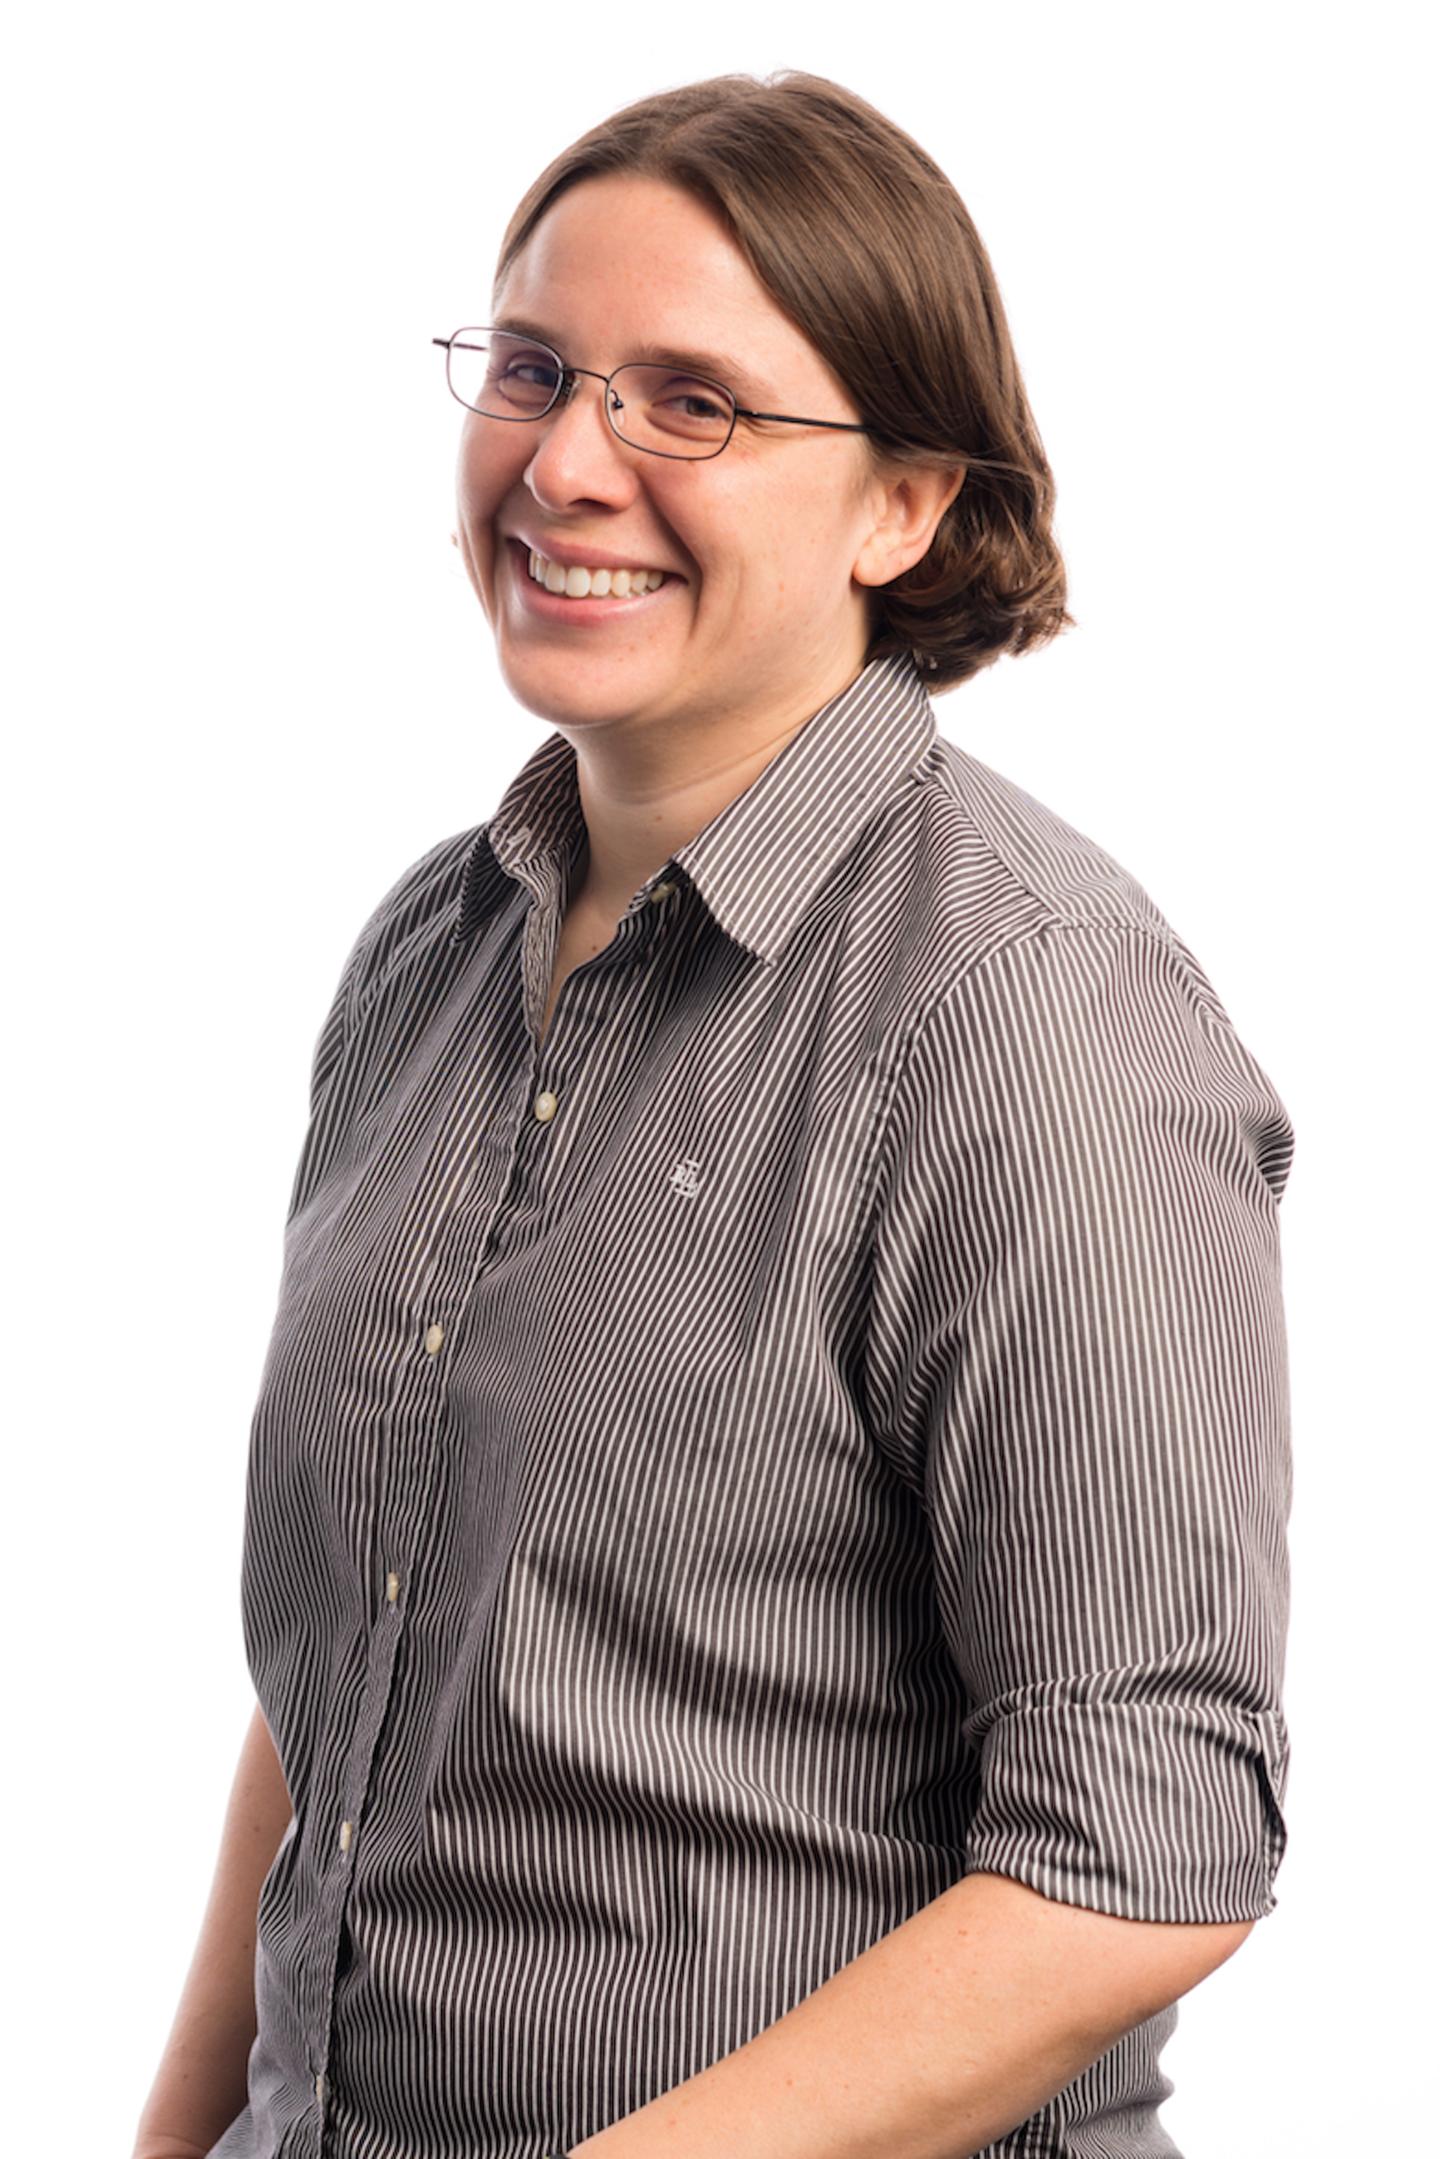 Melonee Wise, CEO, Fetch Robotics